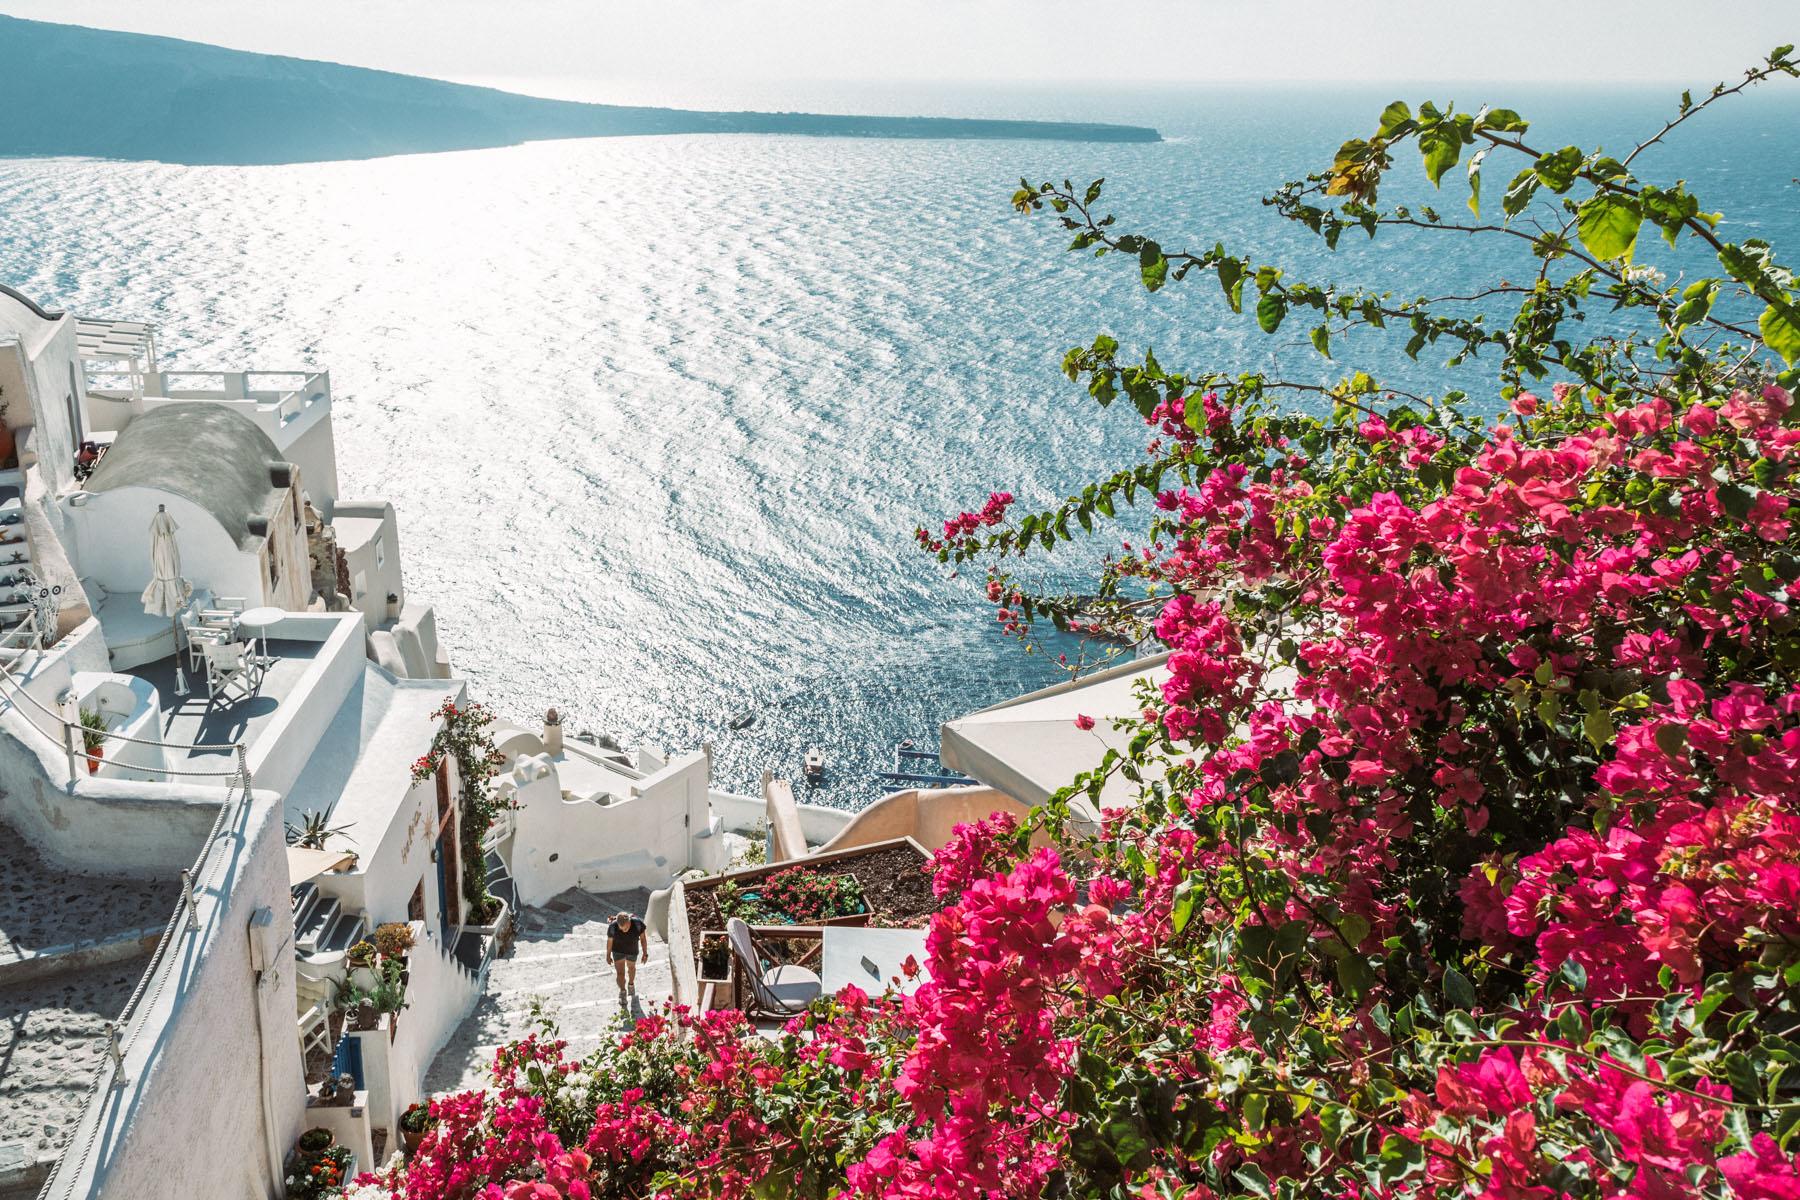 The Ultimate Greece Travel Guide - Santorini & Mykonos // Notjessfashion.com // travel blogger, greece travel tips, mykonos travel tips, santorini travel tips, fashion travel blogger, santorini photos, mykonos photos, santorini travel spots, mykonos travel spots